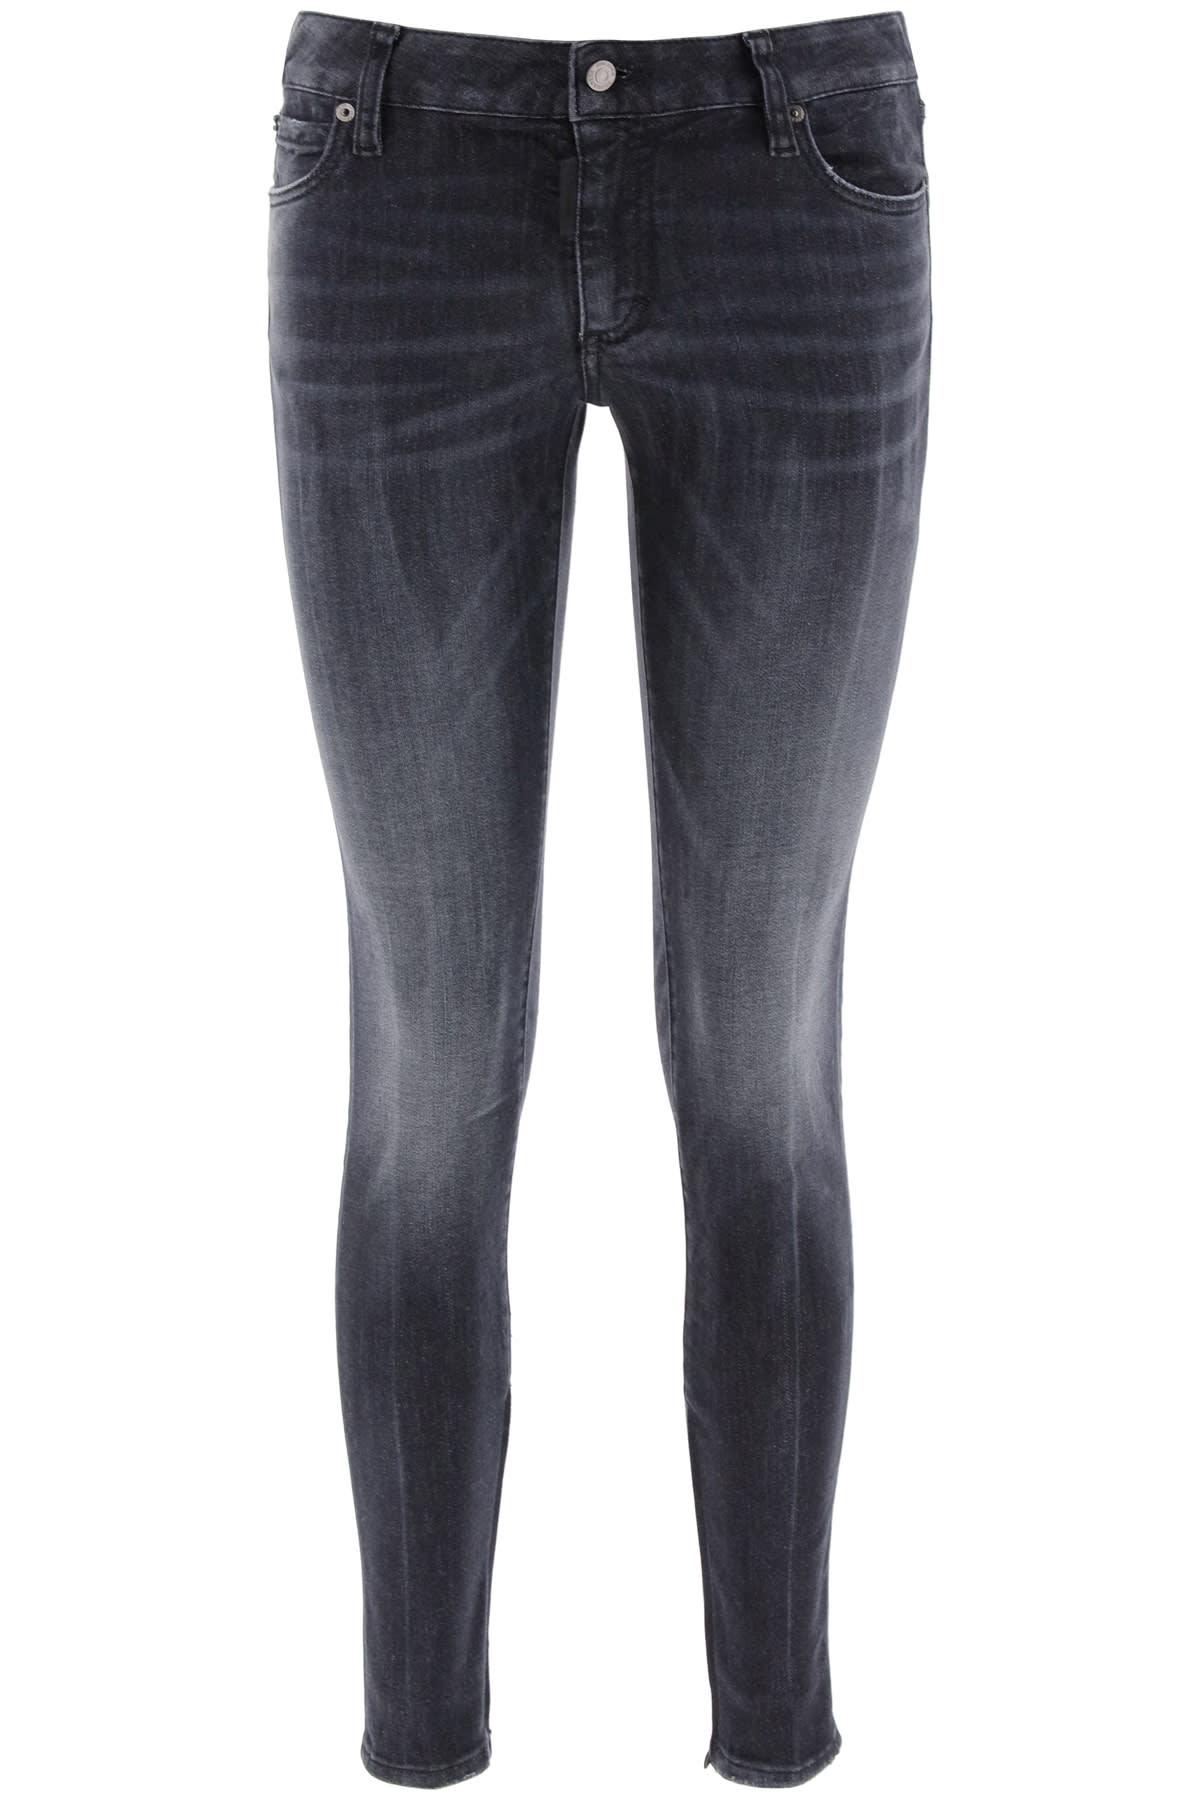 Dsquared2 Twiggy Medium Waist Jeans